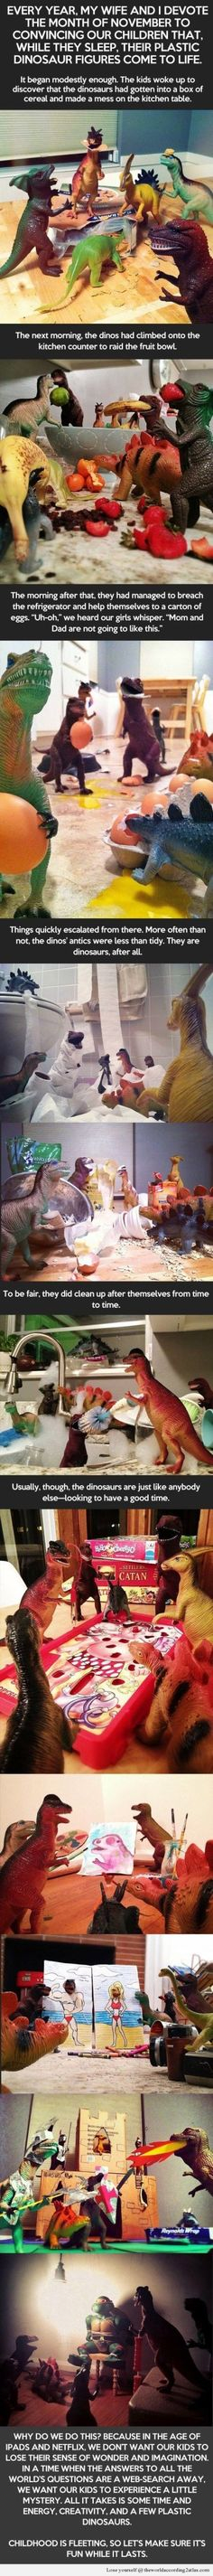 dinosaurs children e1388789053266 The Magical Power of Imagination